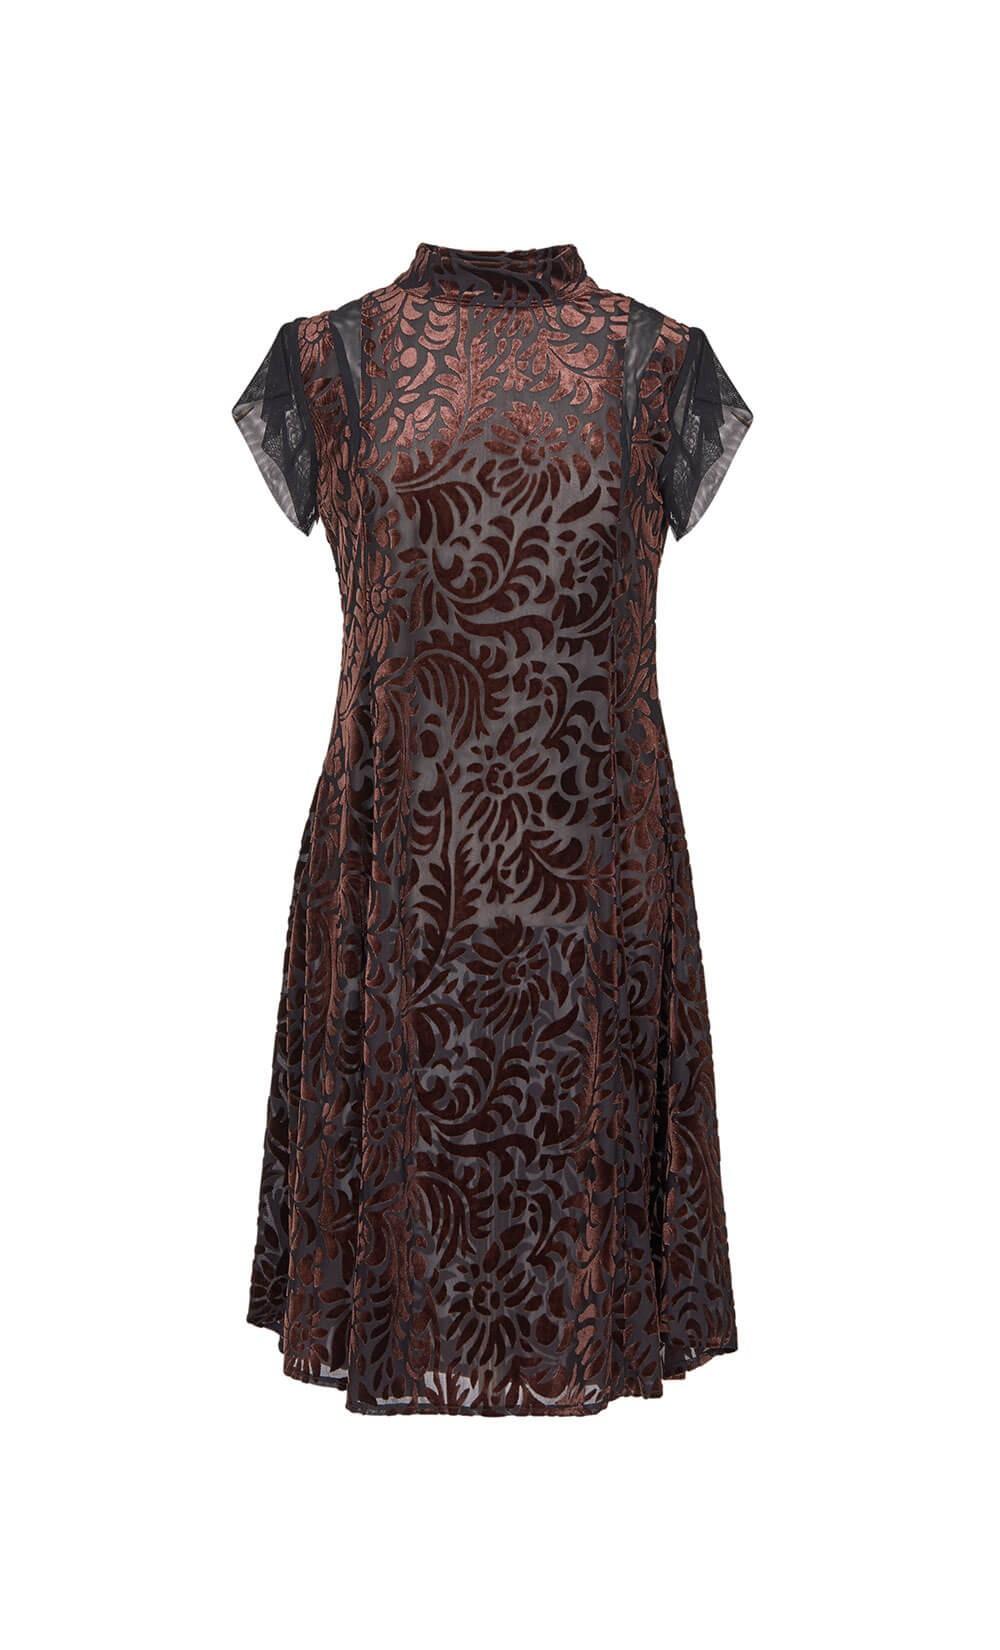 Dalotta Dress